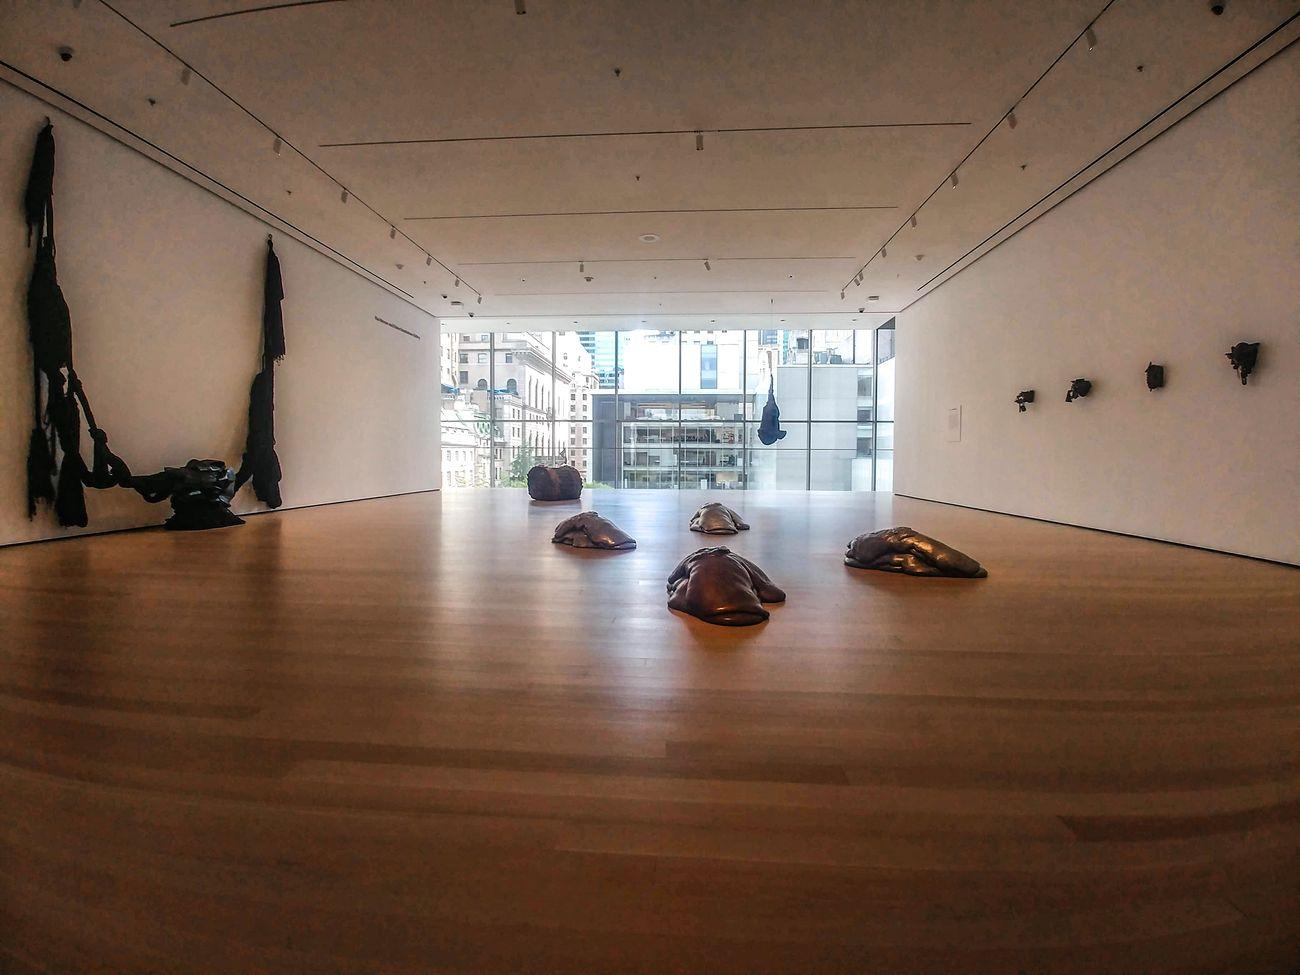 MoMA, New York. La stanza New Monuments, con opere di Barbara Chase-Riboud, Lynda Benglis e Louise Bourgeois. Photo Maurita Cardone